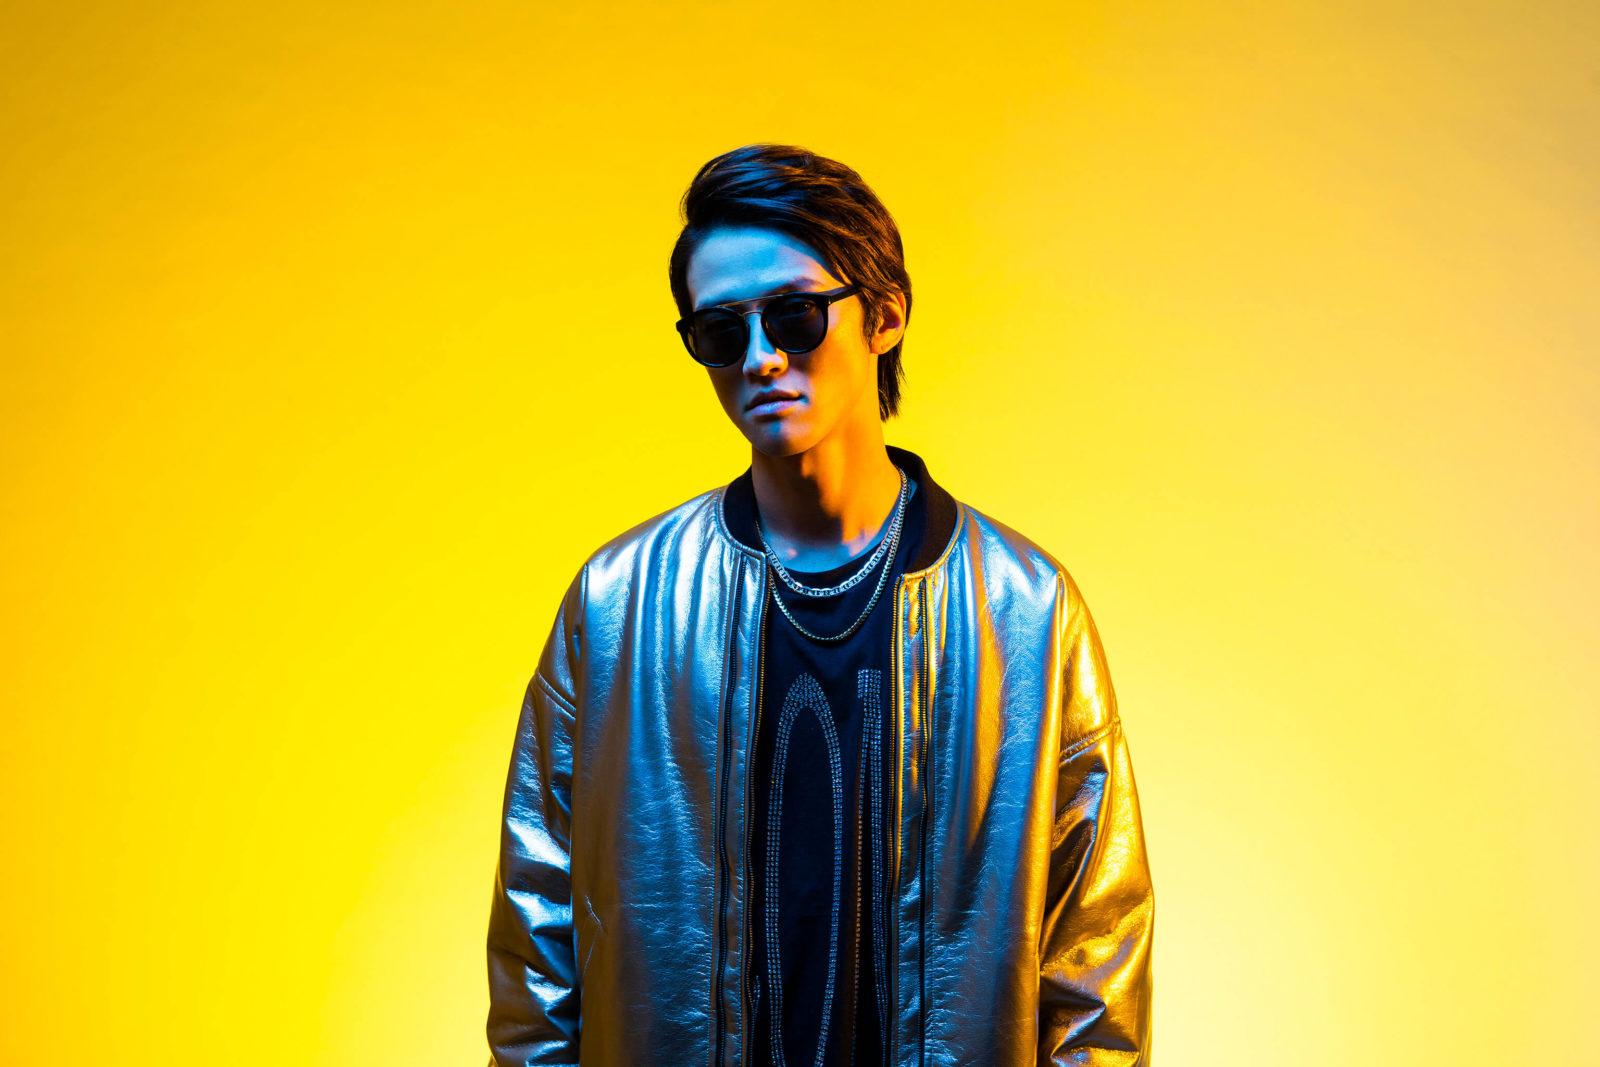 Hilcrhymeプロデュースのワイヤレスイヤホン発売決定!アルバムリード曲先行配信&MV公開サムネイル画像